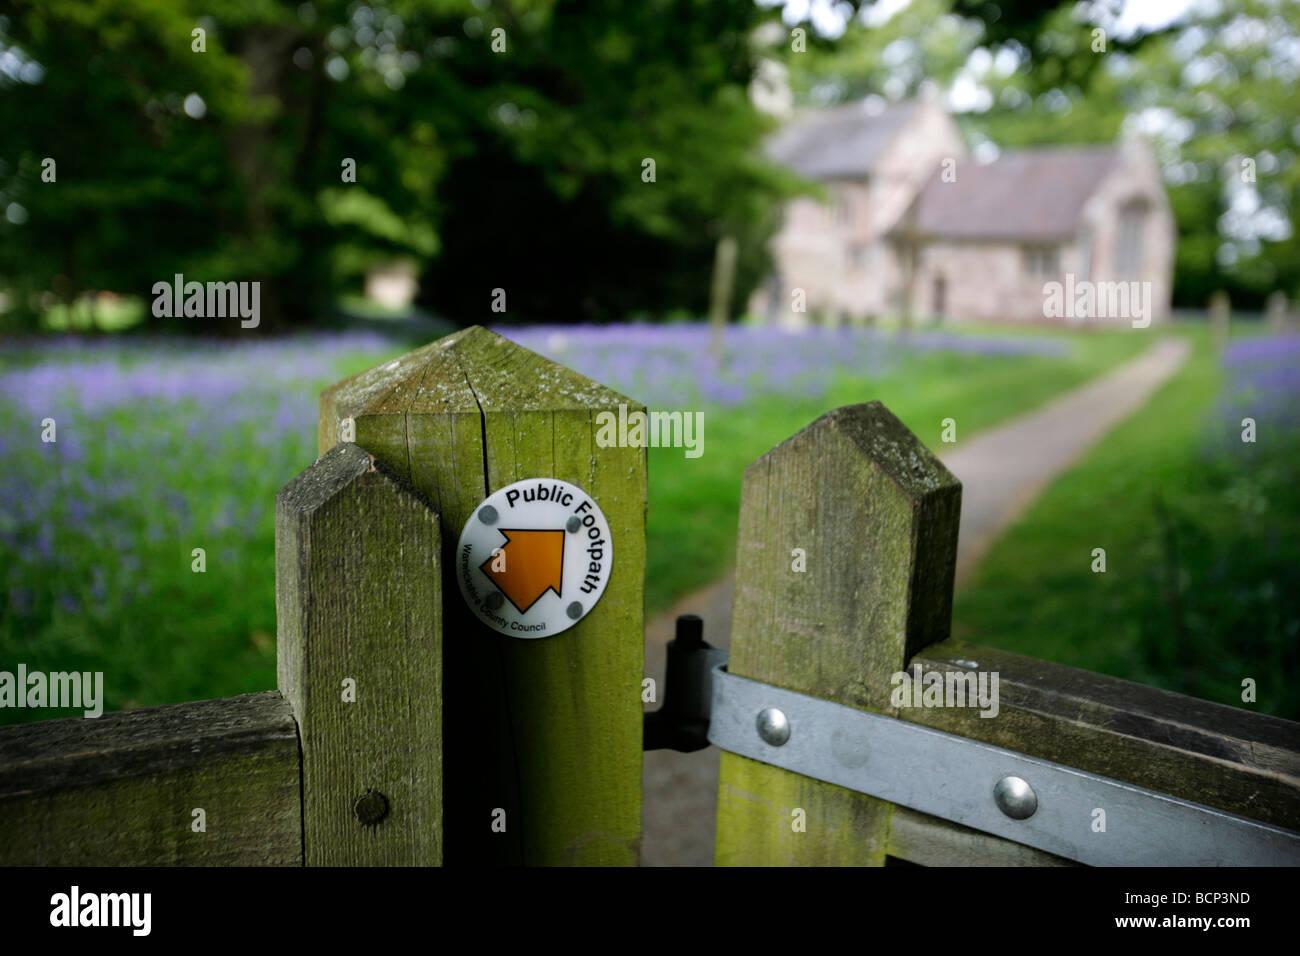 A public footpath leading through a churchyard in Warwickshire, UK - Stock Image